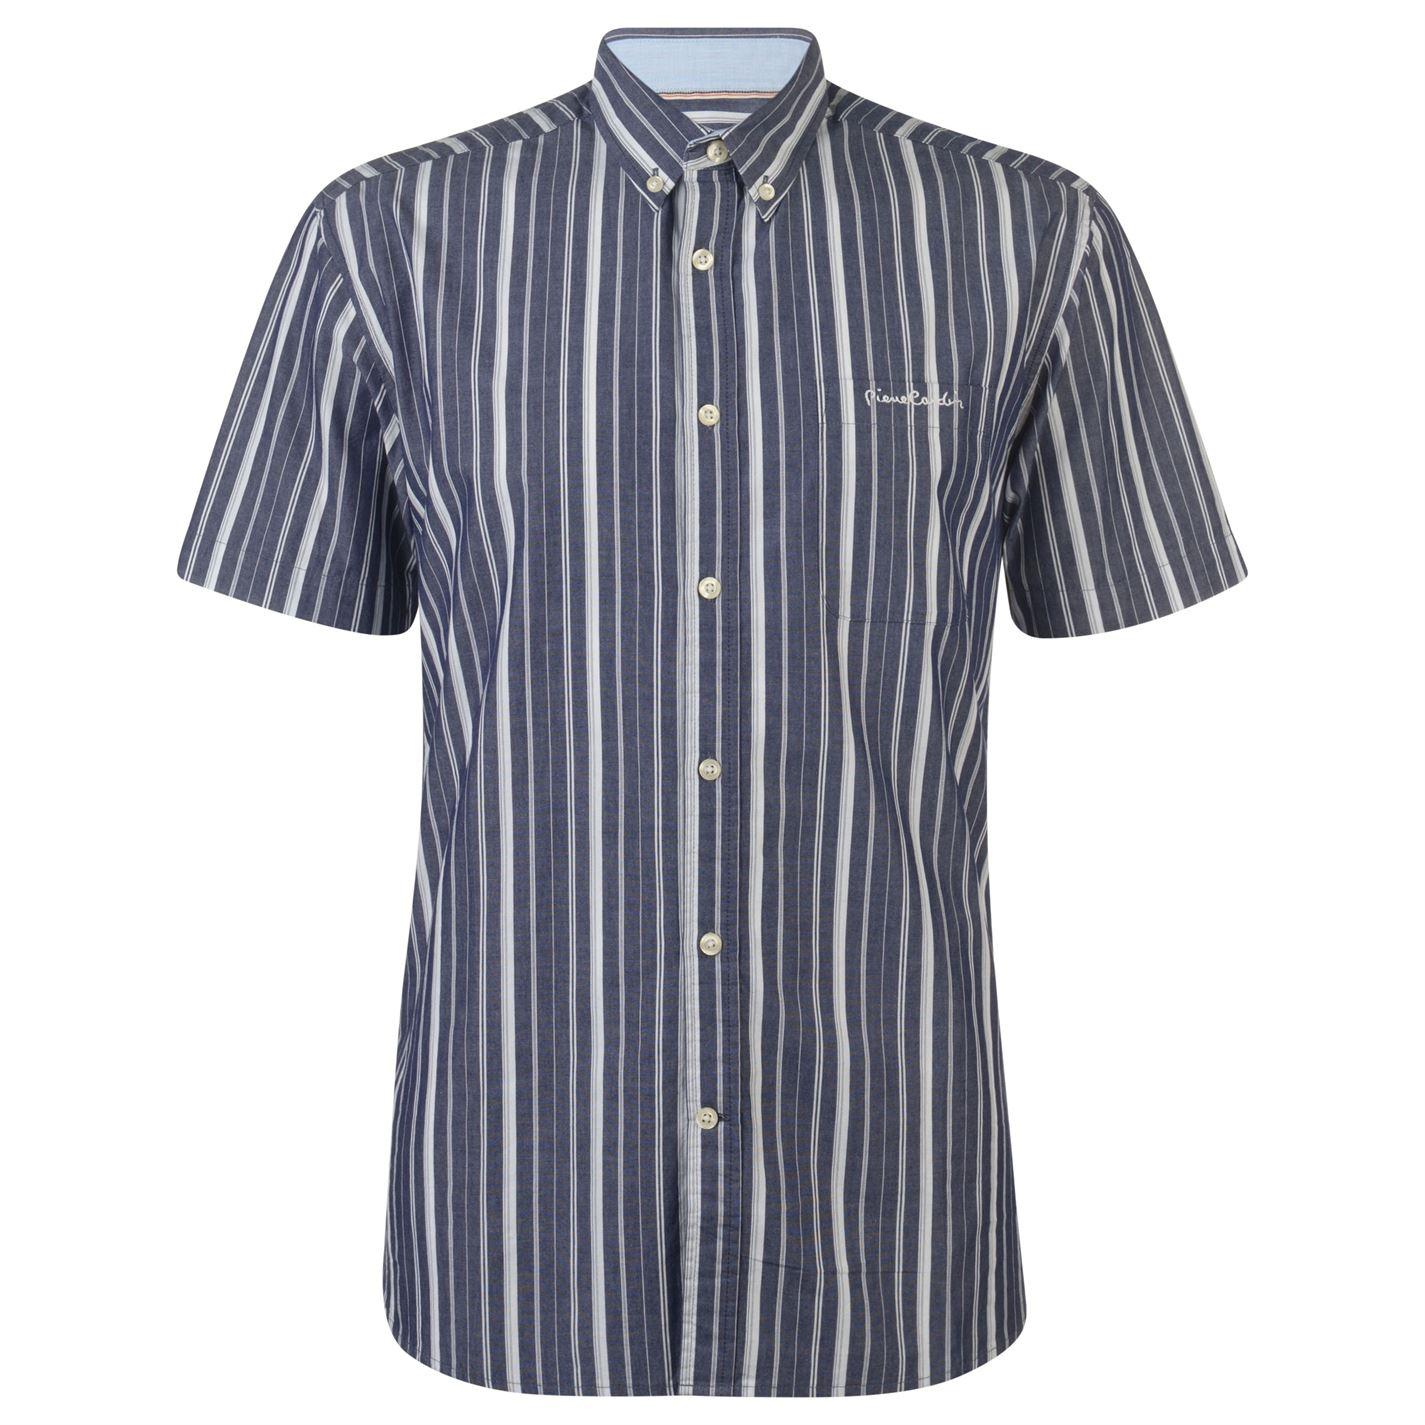 Pierre Cardin Stripe Short Sleeve Shirt Mens